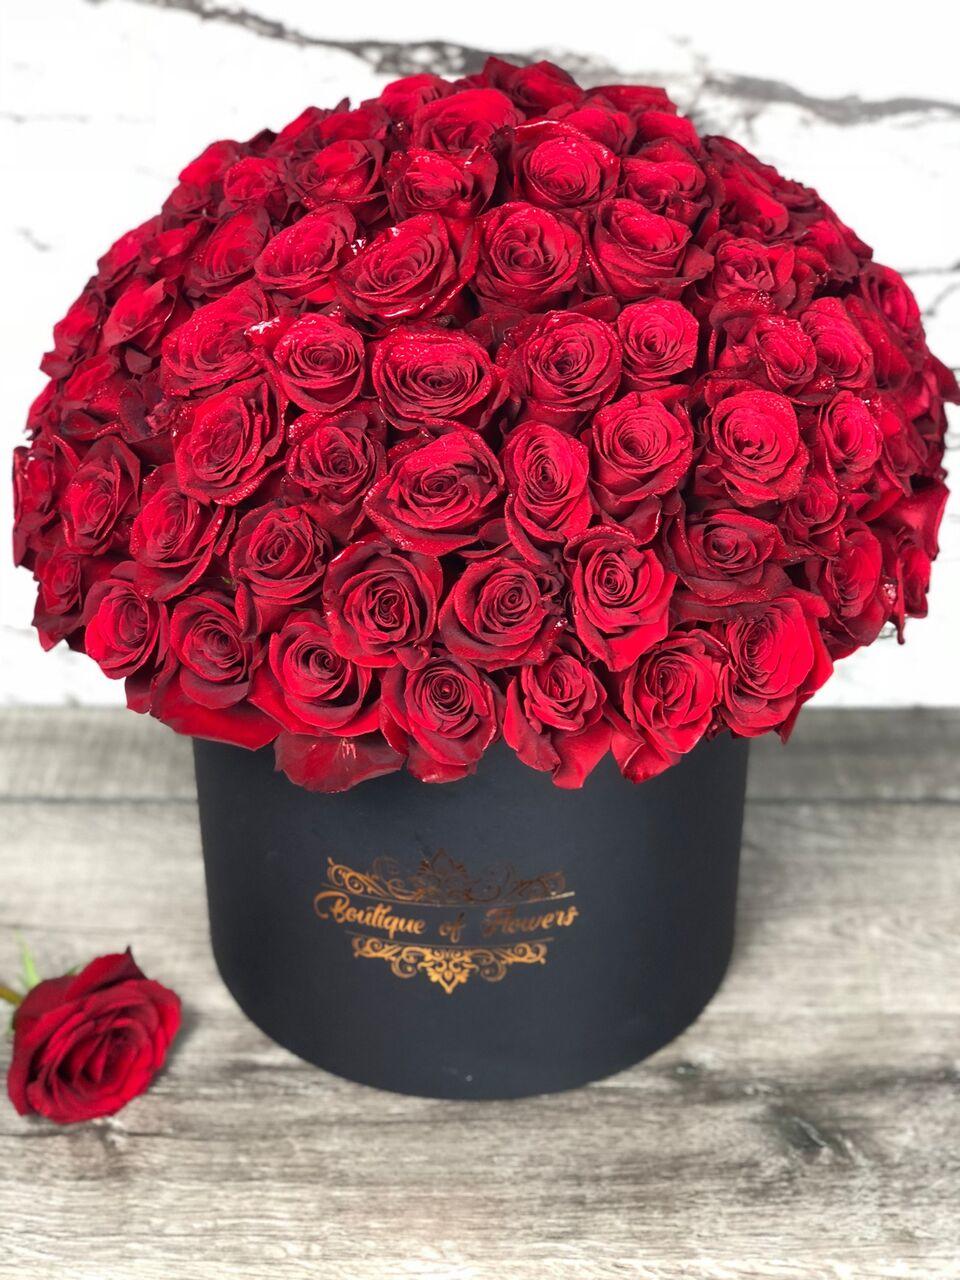 100 RED ROSE LARGE ROUND BOX